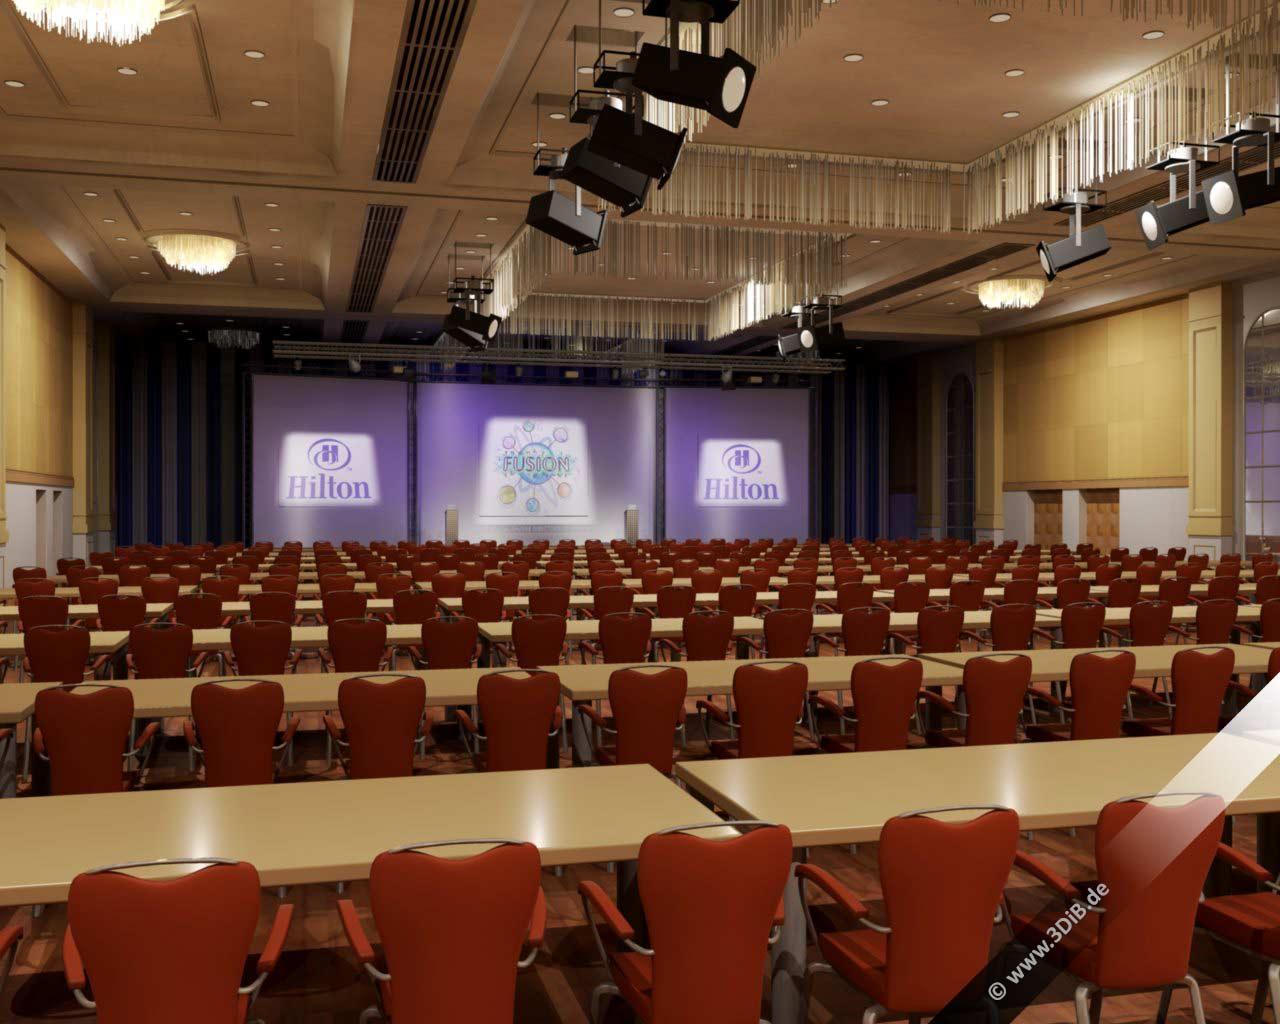 Eventvisualisierung Hilton Ballsaal